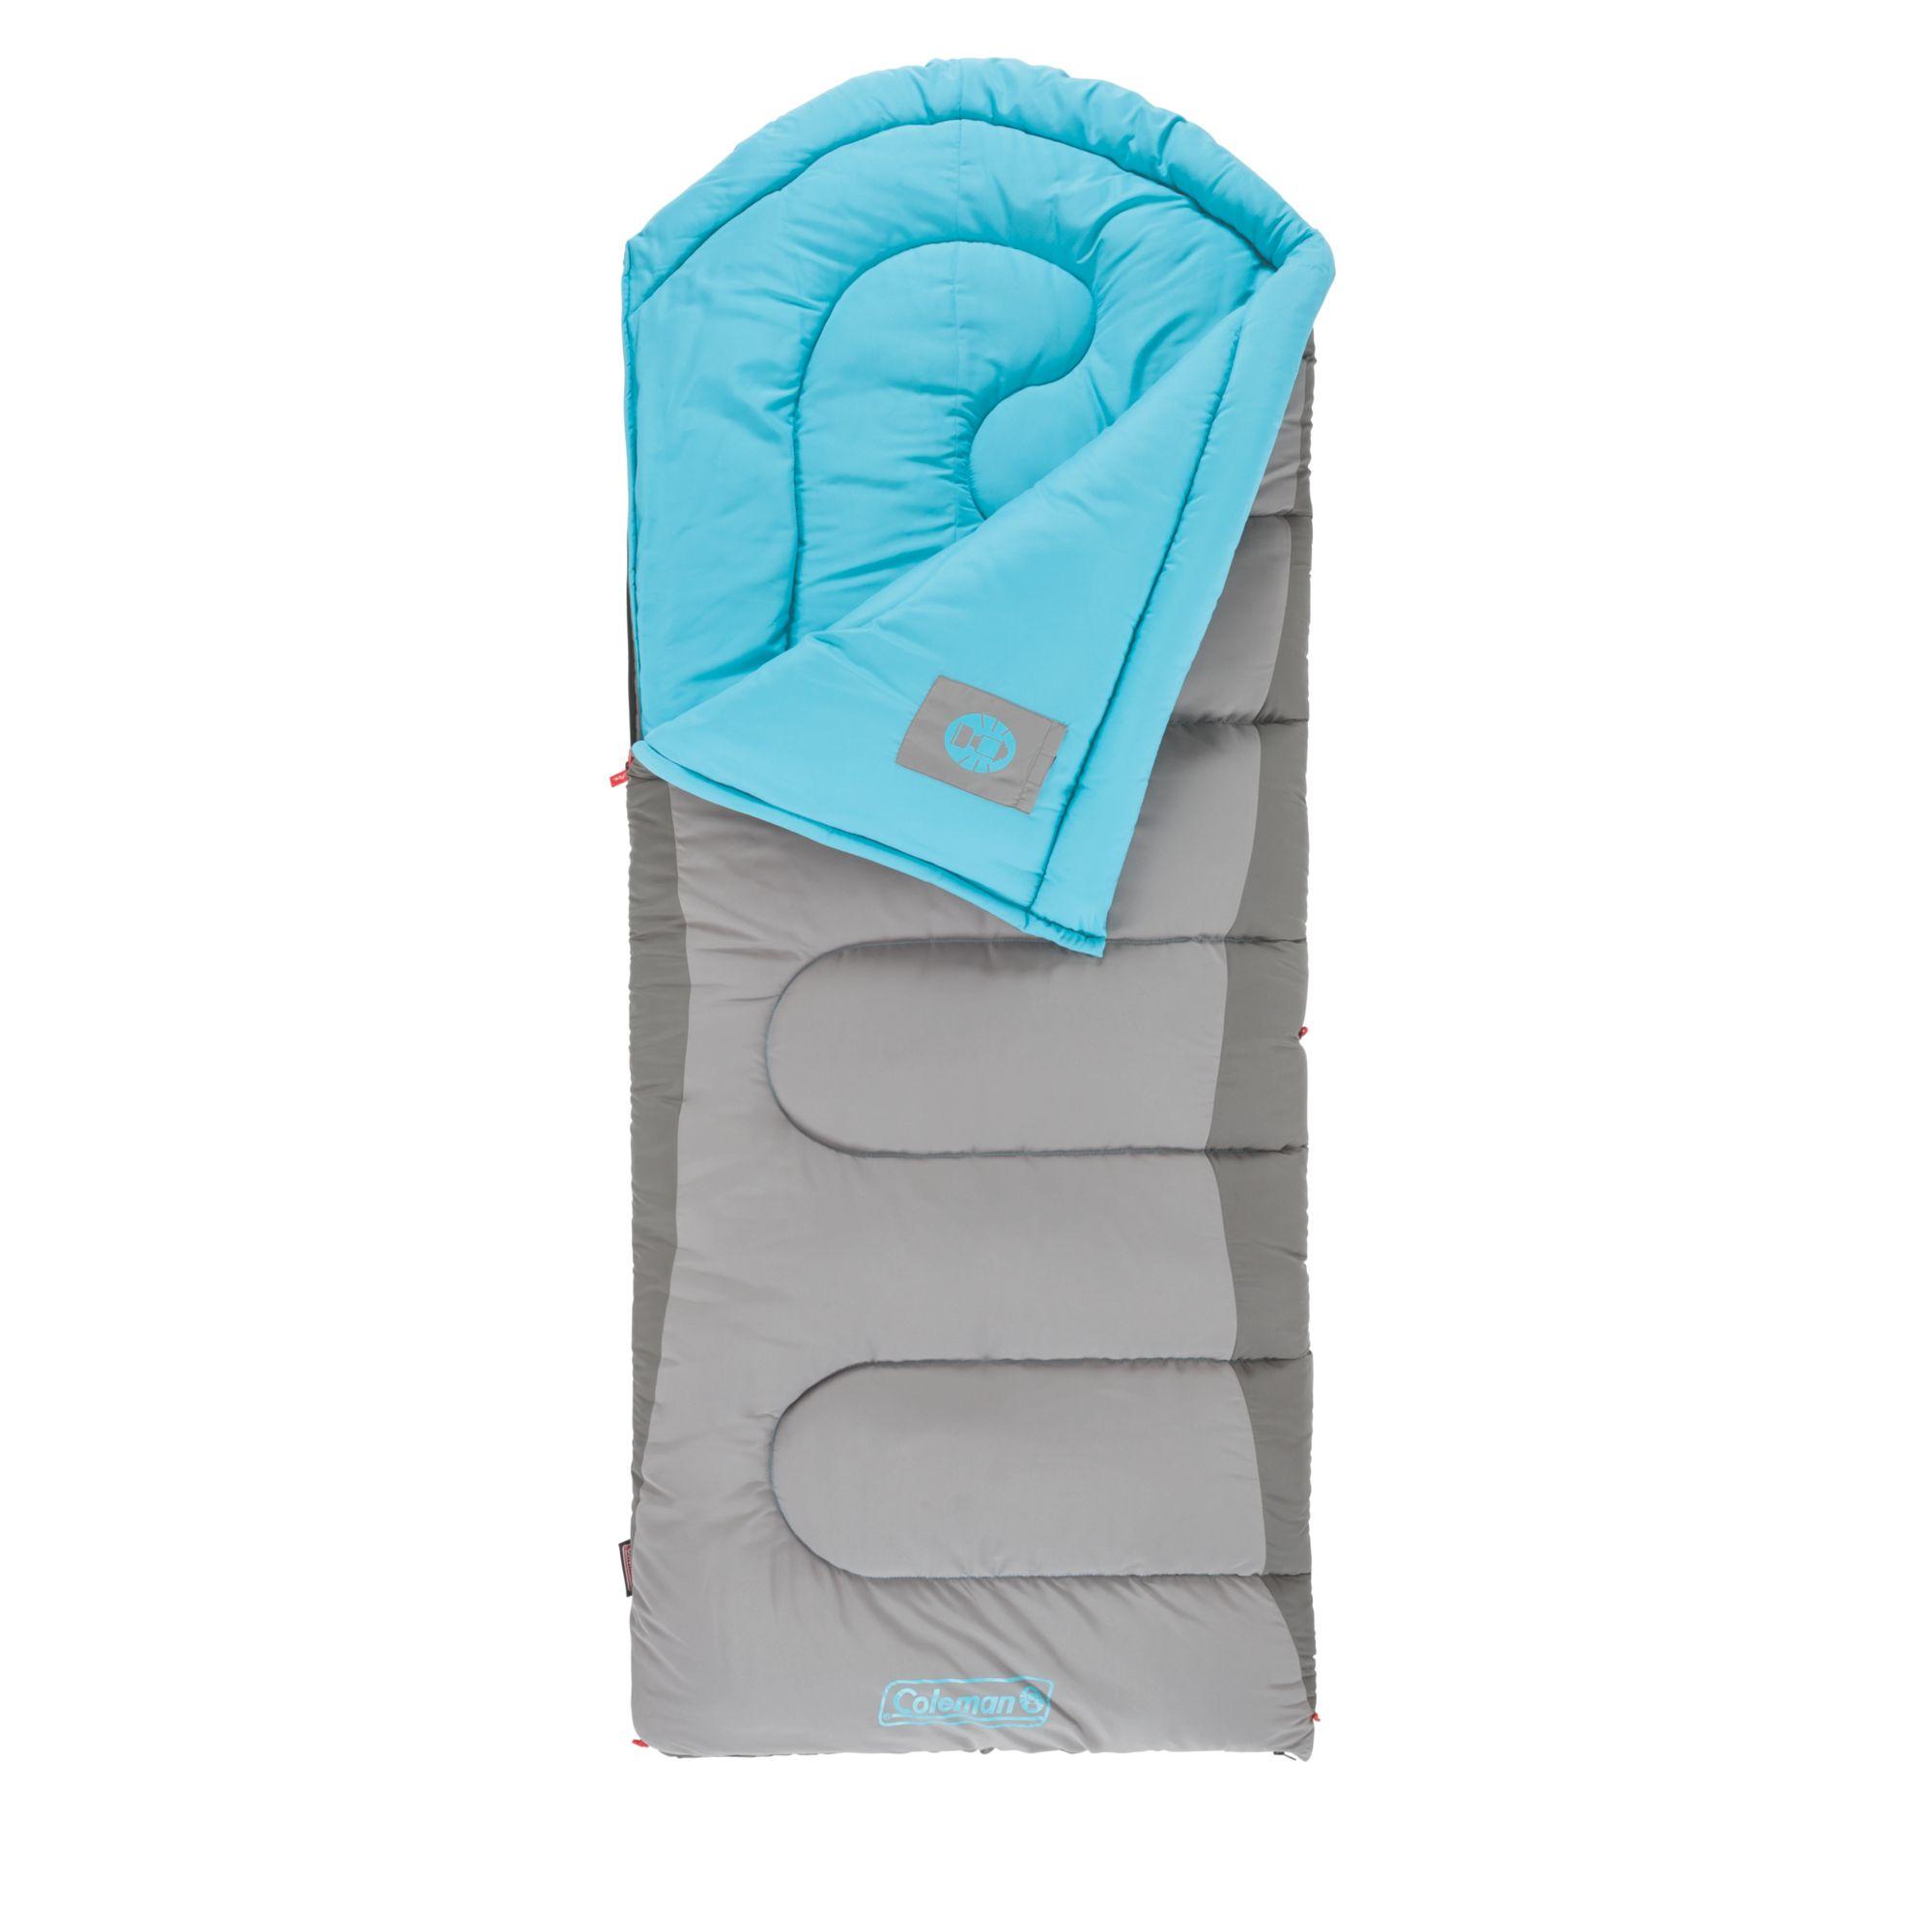 comp pump p collection vietri a product dwp heat comfort desktop belk incanto comforter layer aqua zoom src